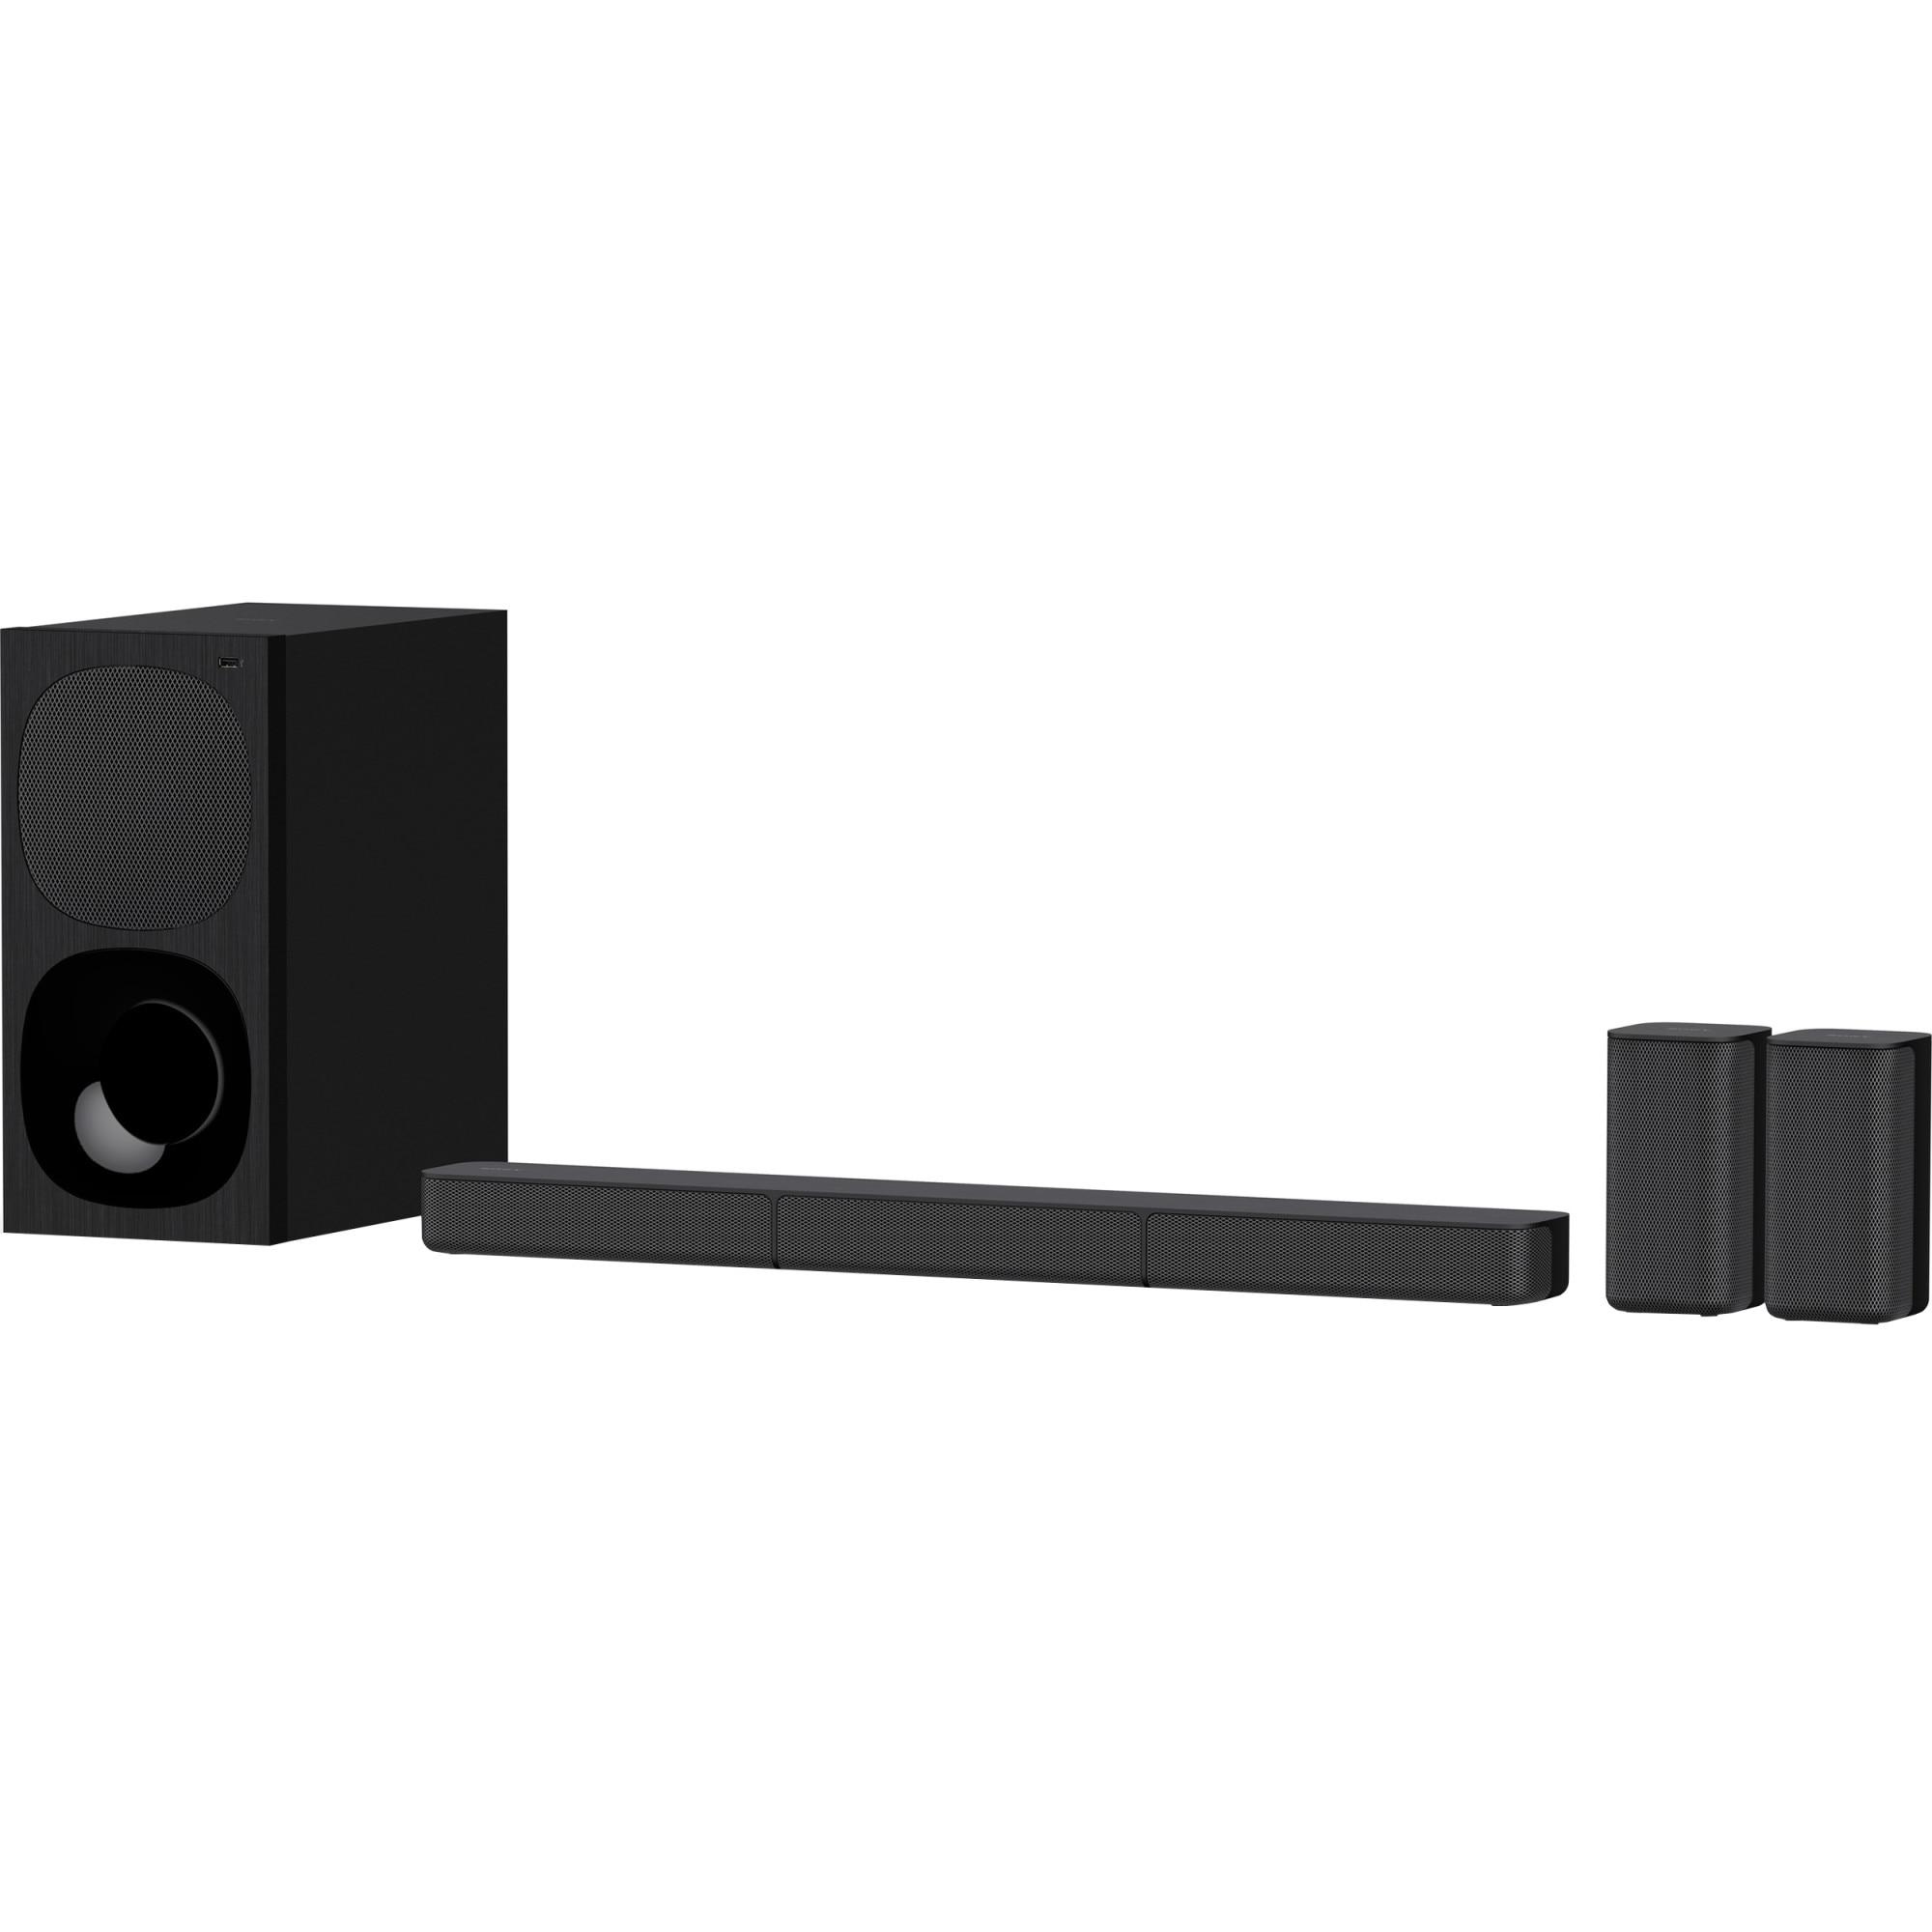 Fotografie Soundbar Sony HT-S20R, 400W, 5.1, Bluetooth, HDMI ARC, USB